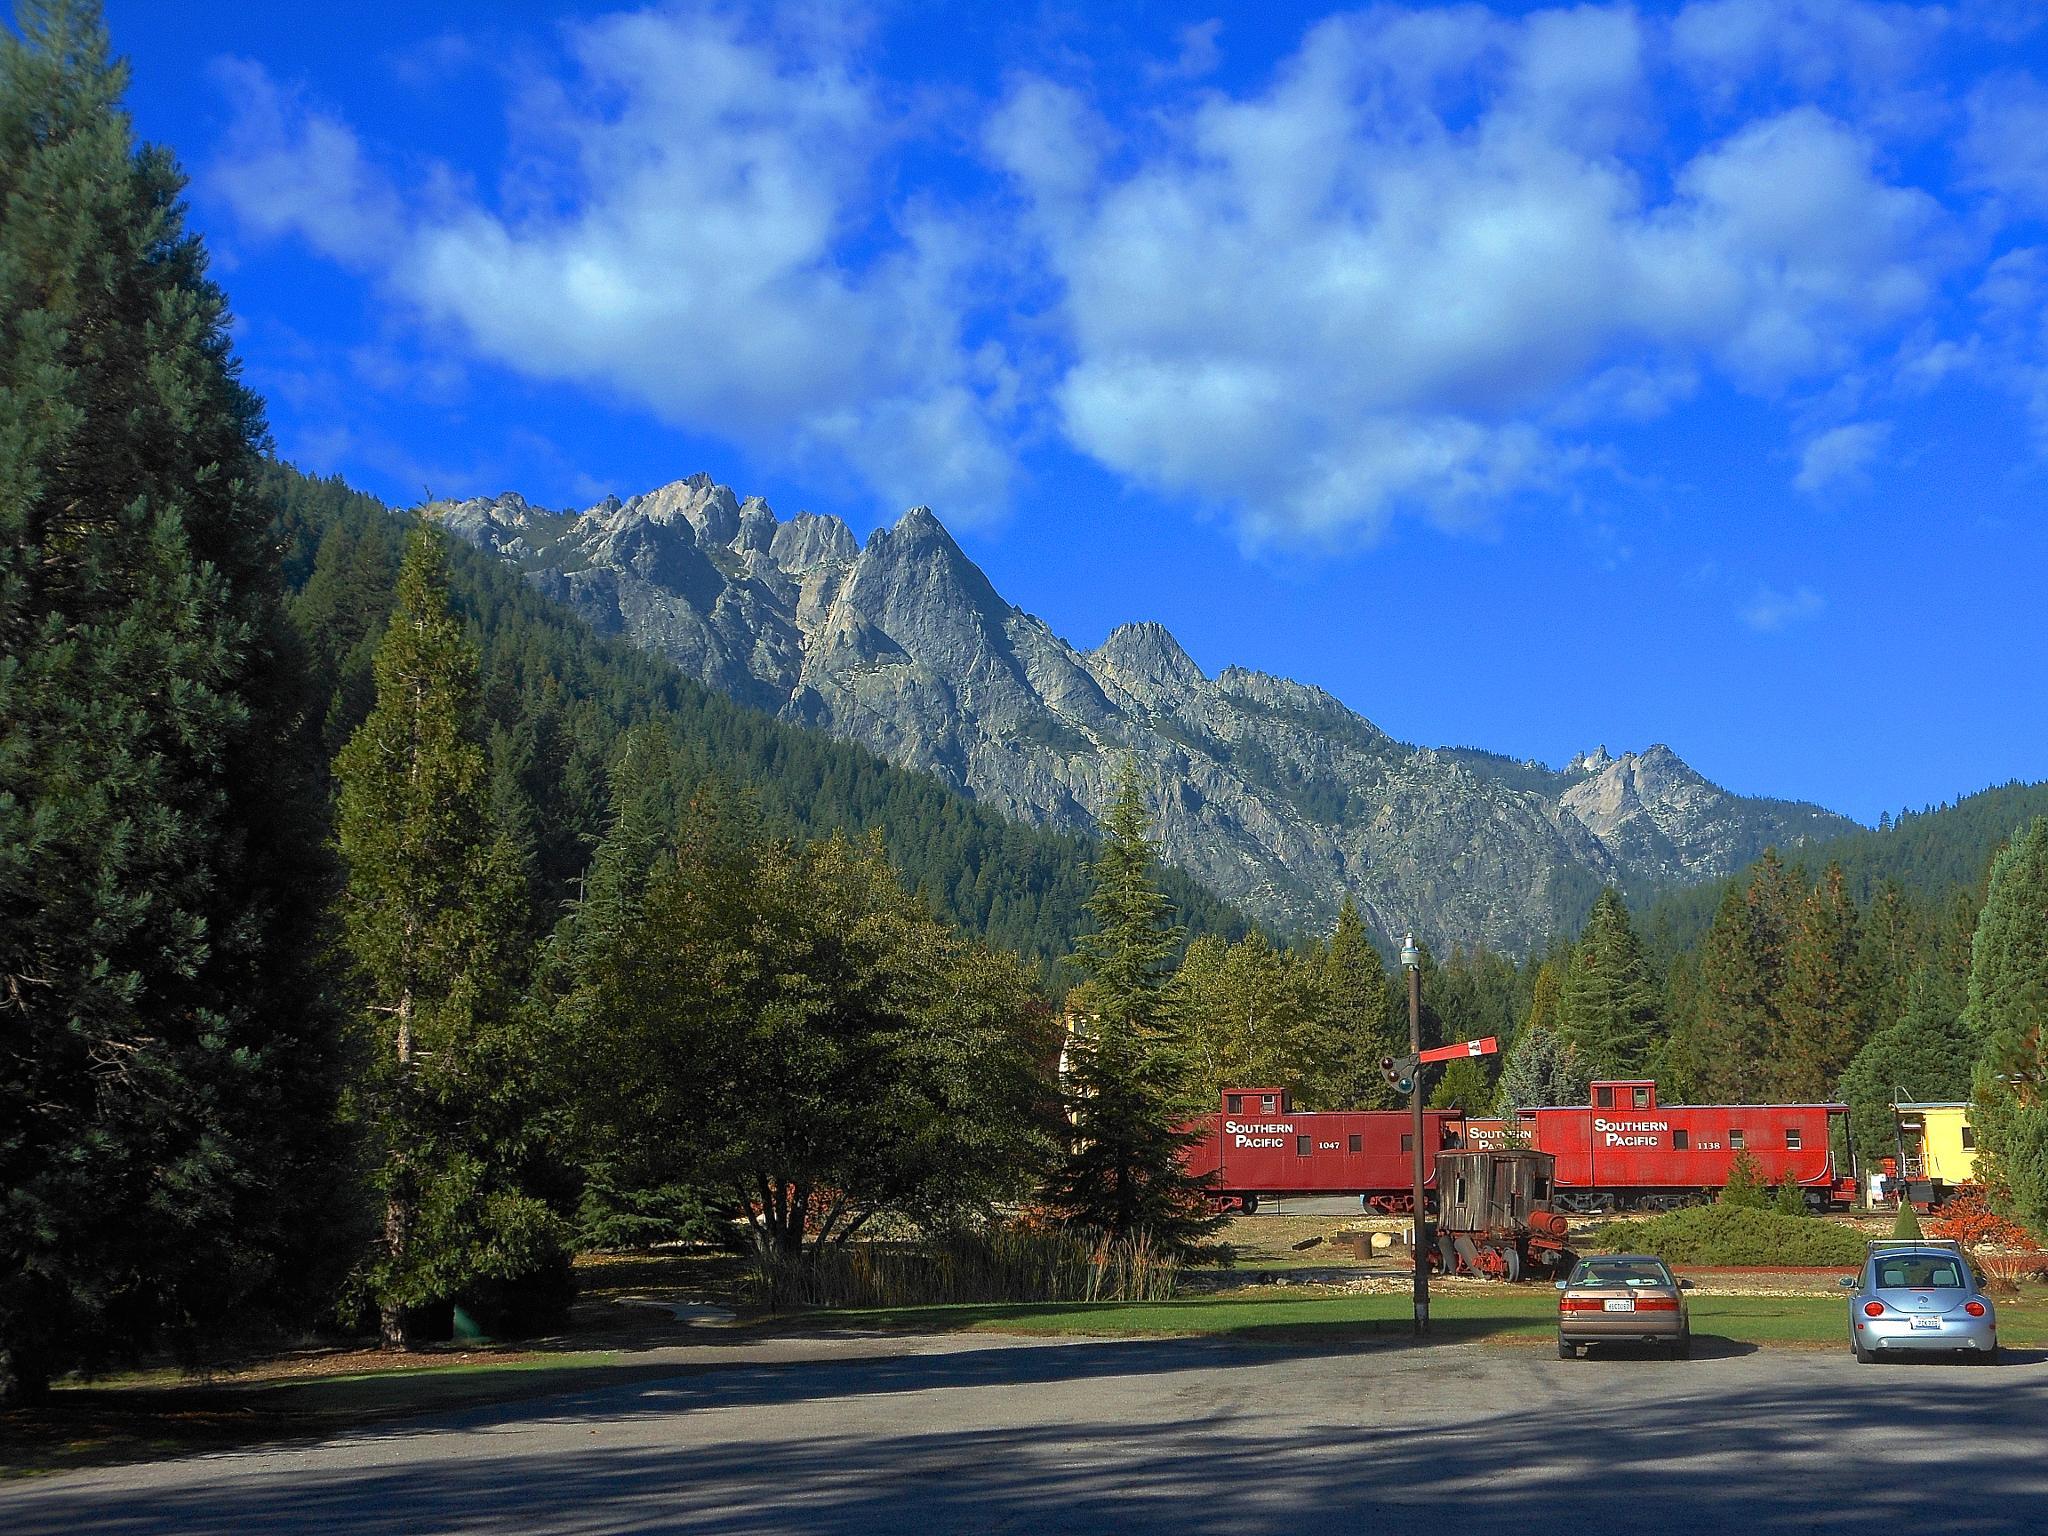 Train Park Lodging by John Norman Stewart